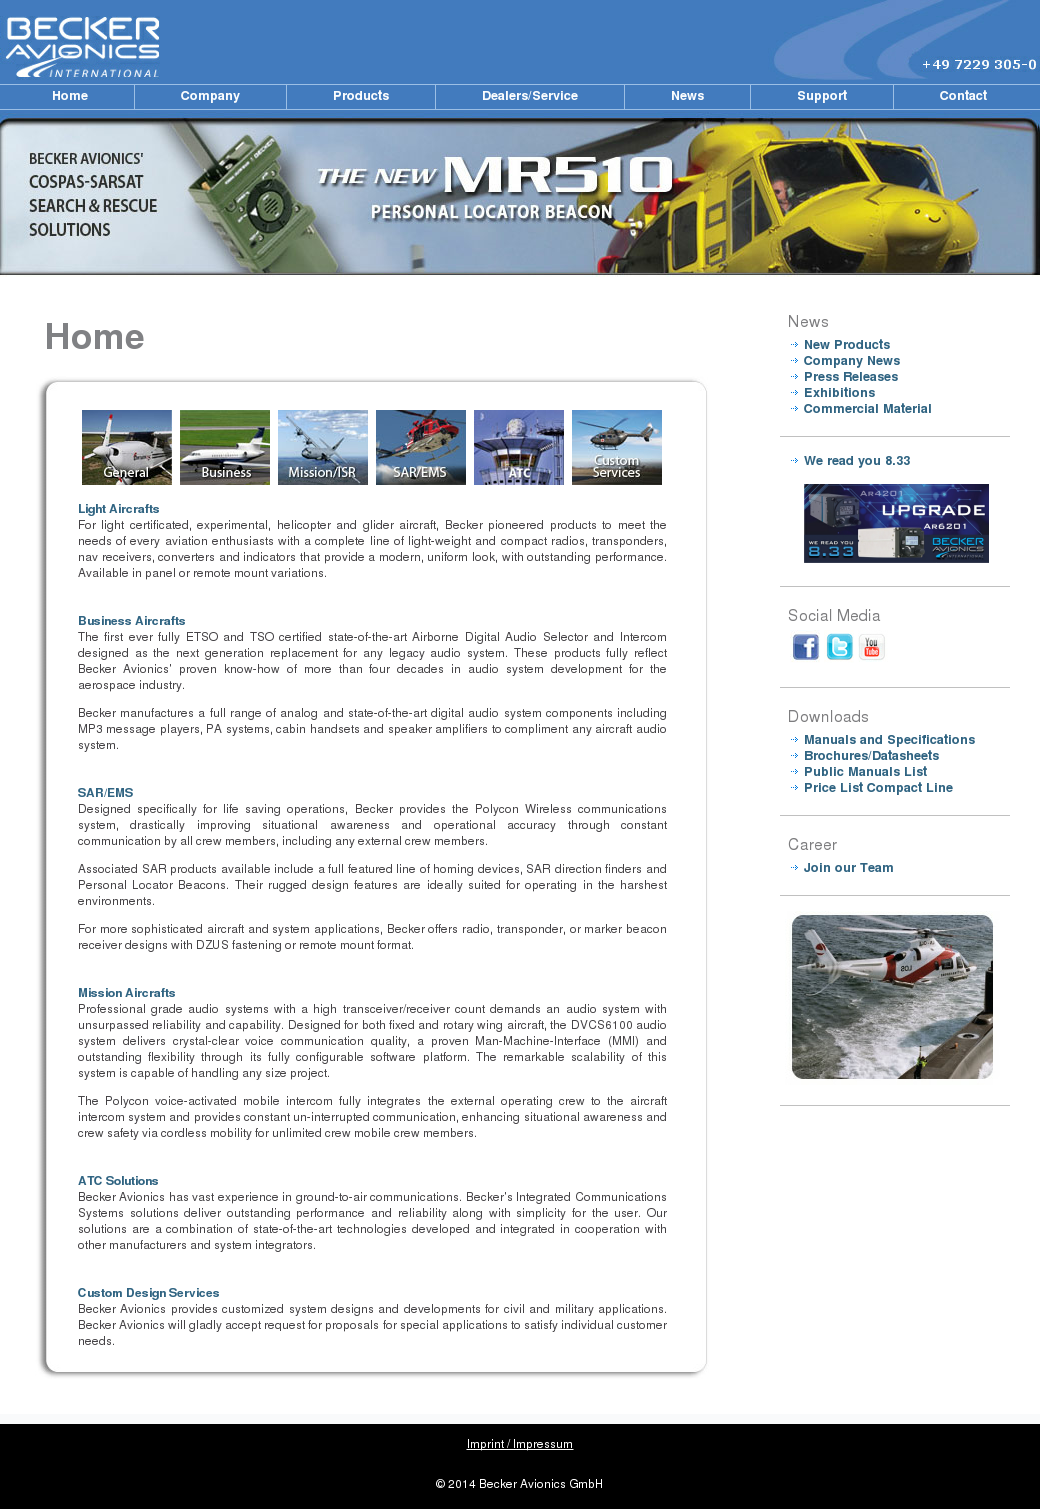 Becker Avionics Competitors, Revenue and Employees - Owler